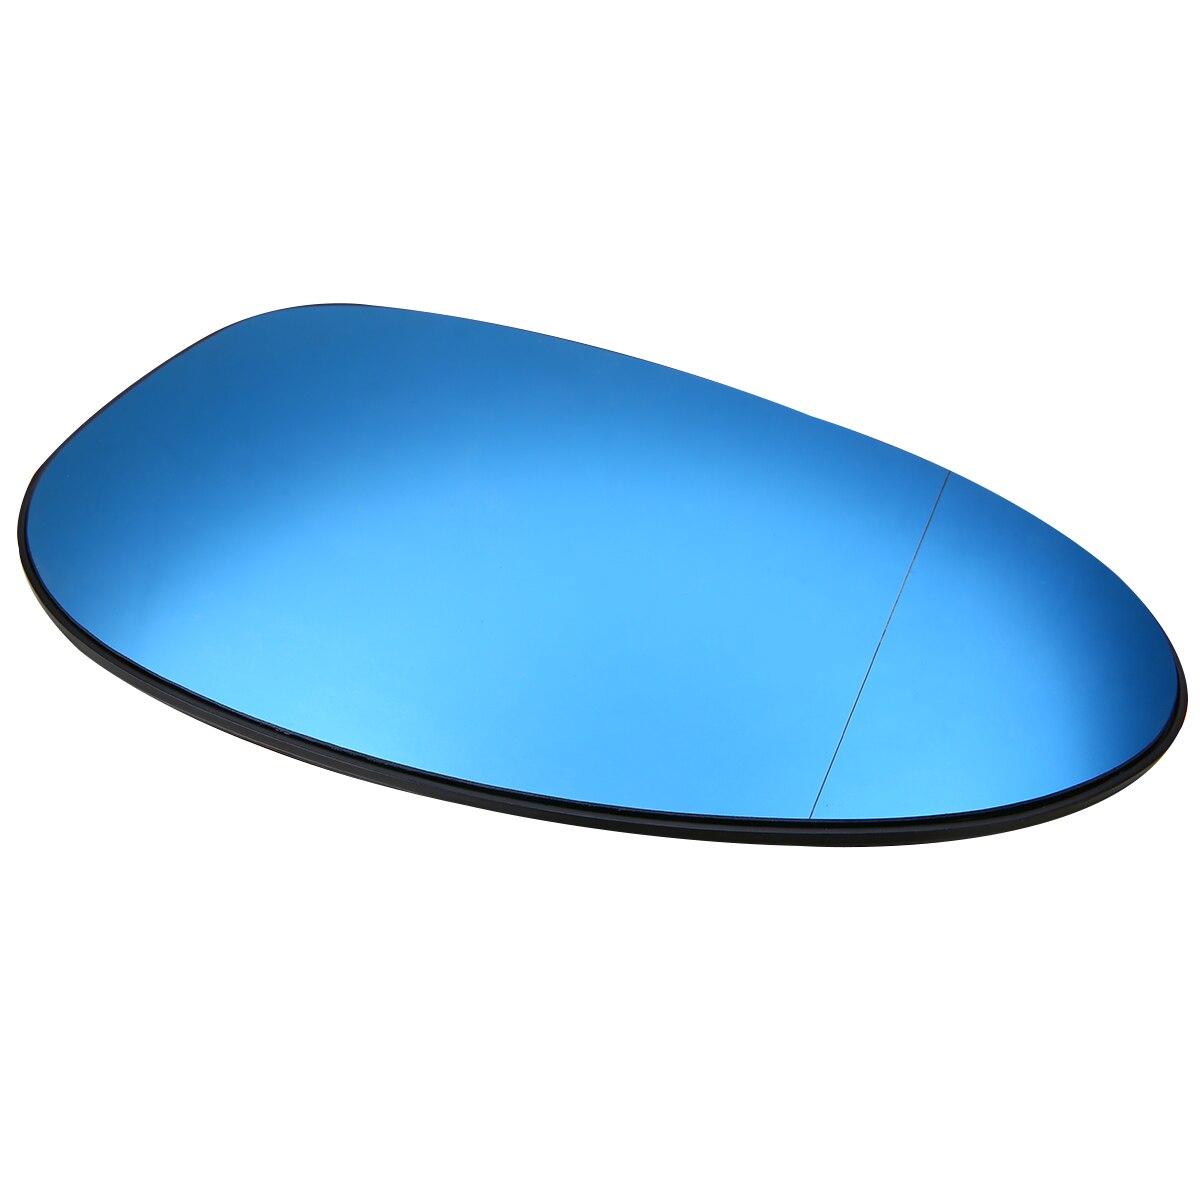 New Arrival 1Pair Door Mirror Glass Heated Blue Glasses 51167145267 Left/ 51167145268 Right For BMW E82 E90 E91 E92 E46